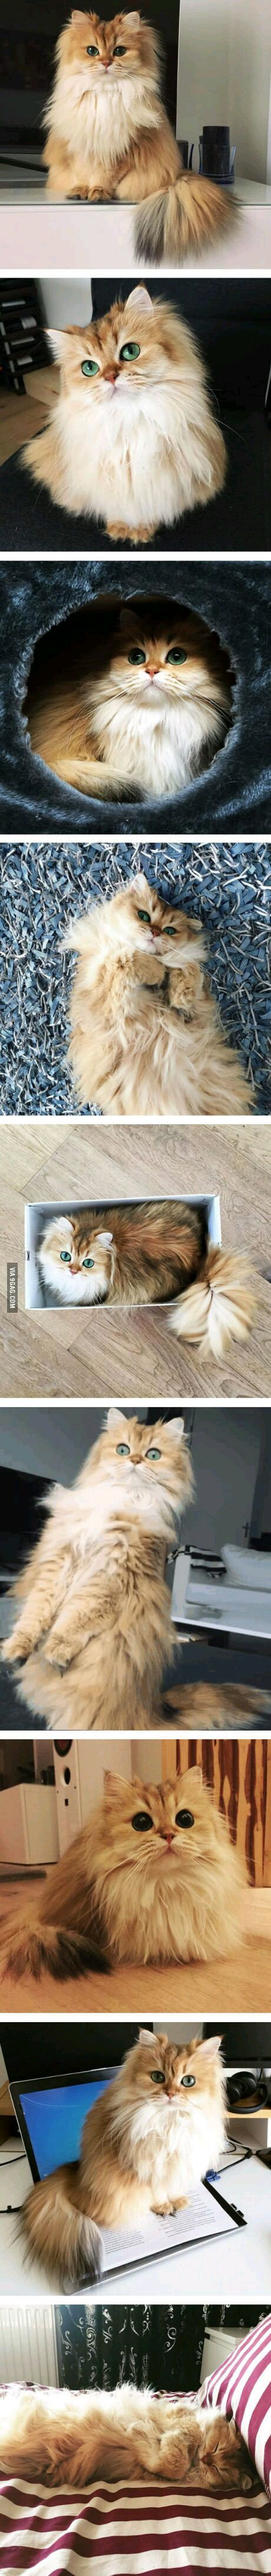 #CAT #Cats #catlover